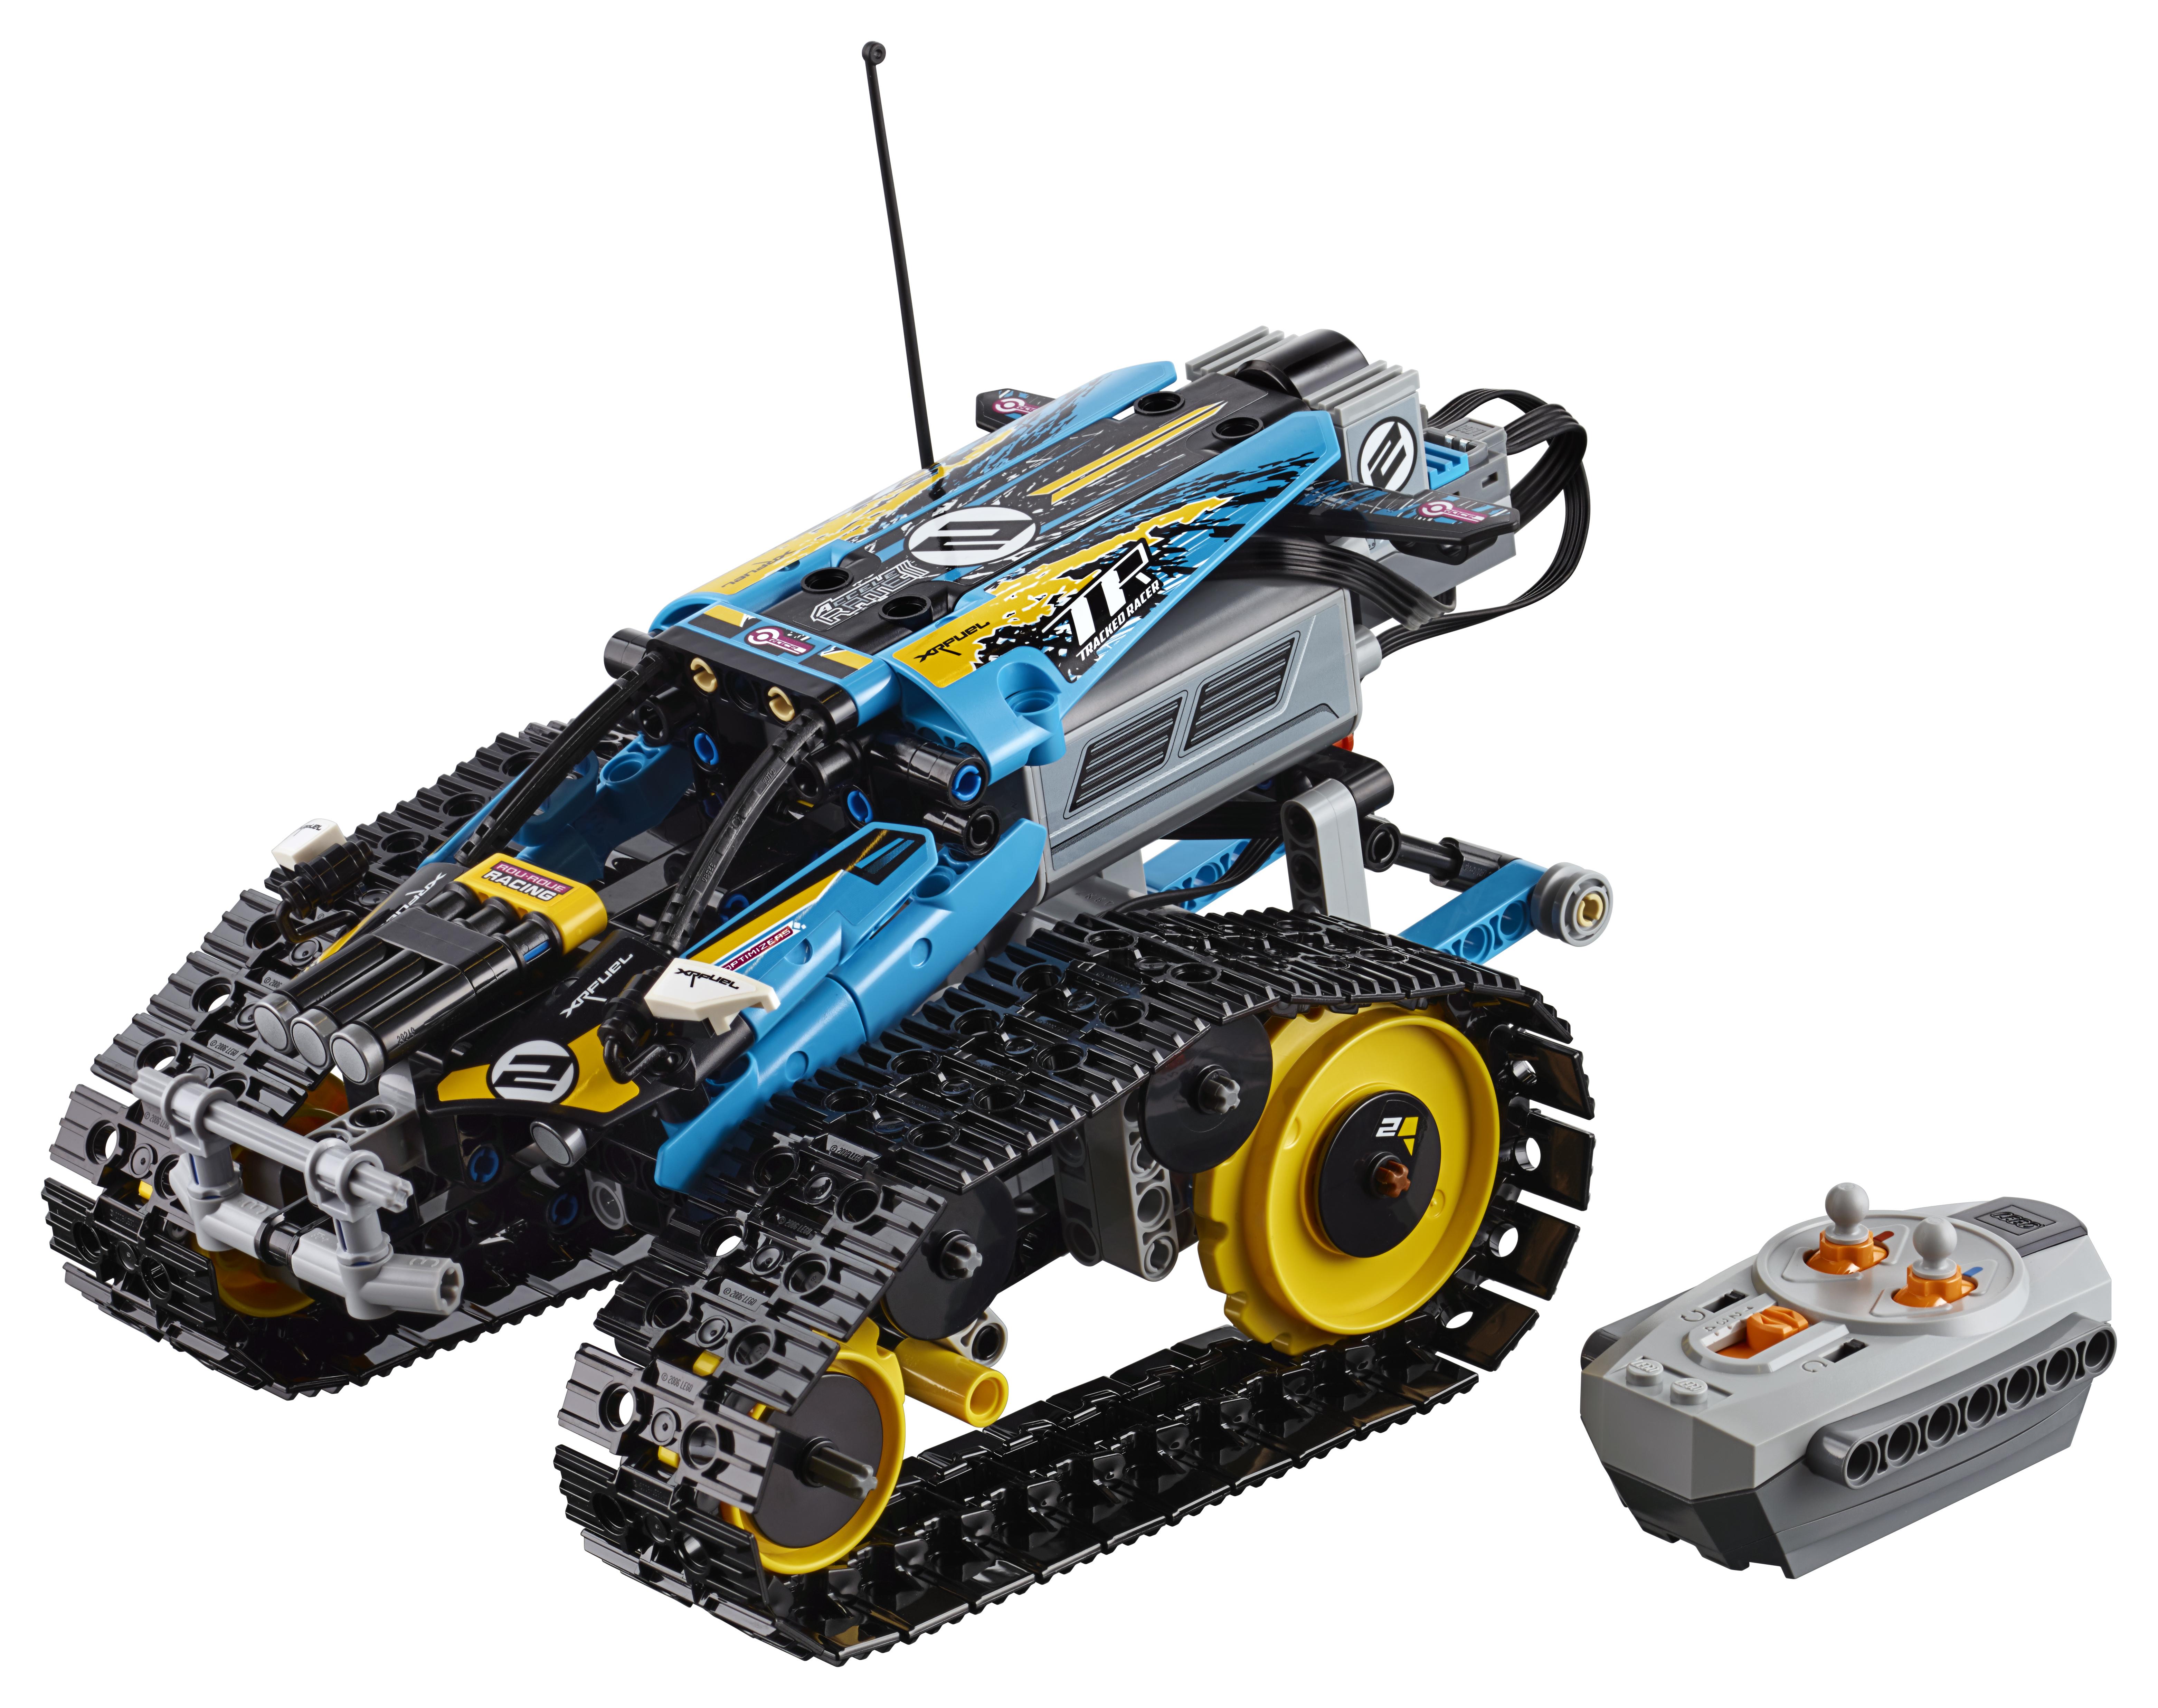 LEGO TECHNIC - Stunt Racer telecomandato 42095 - Toys Center